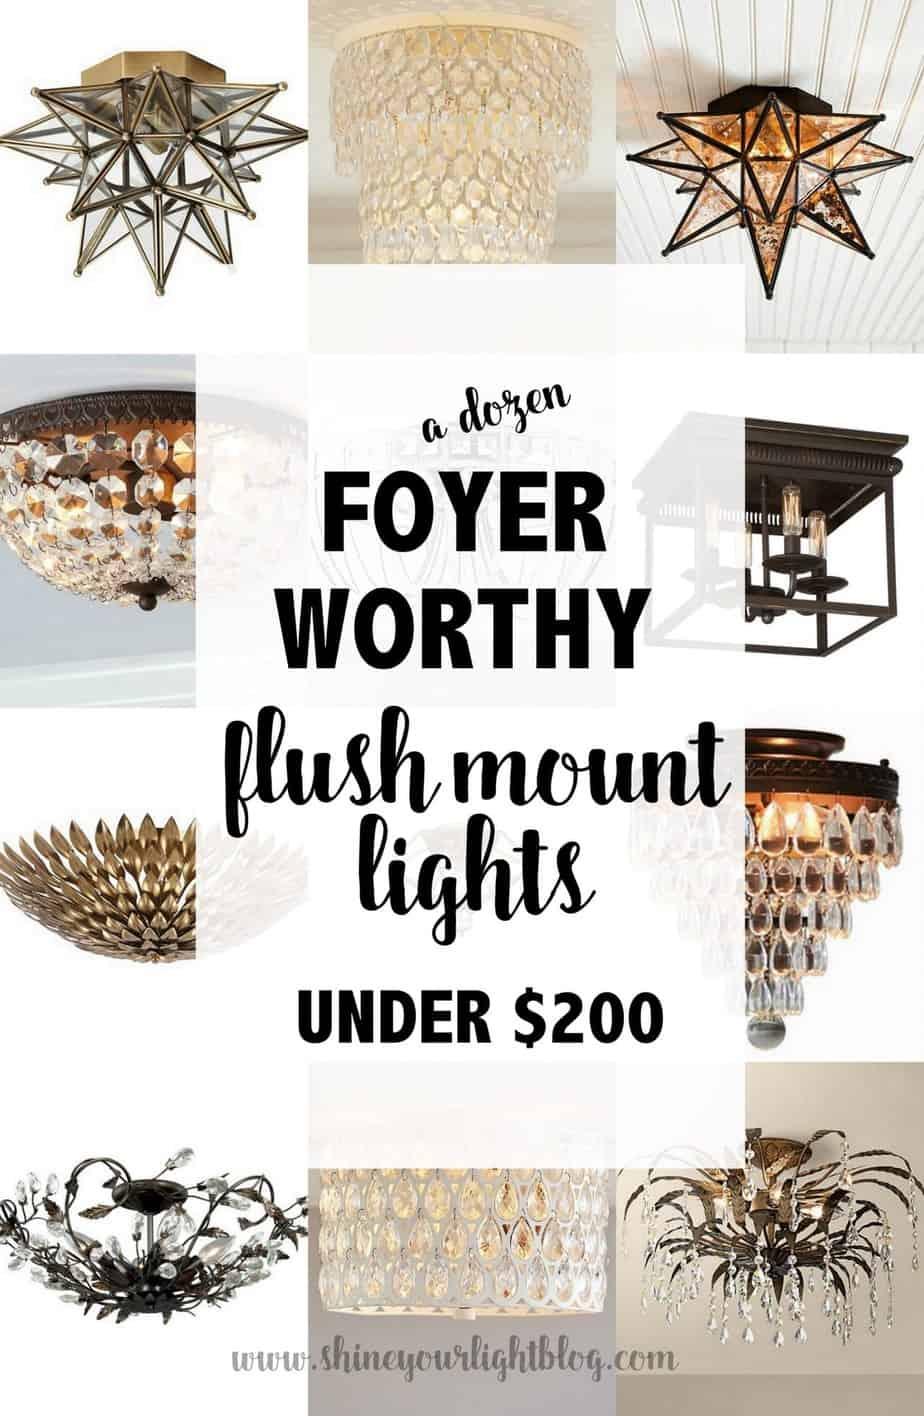 Foyer Worthy Flush Mount Ceiling Lights Shine Your Light